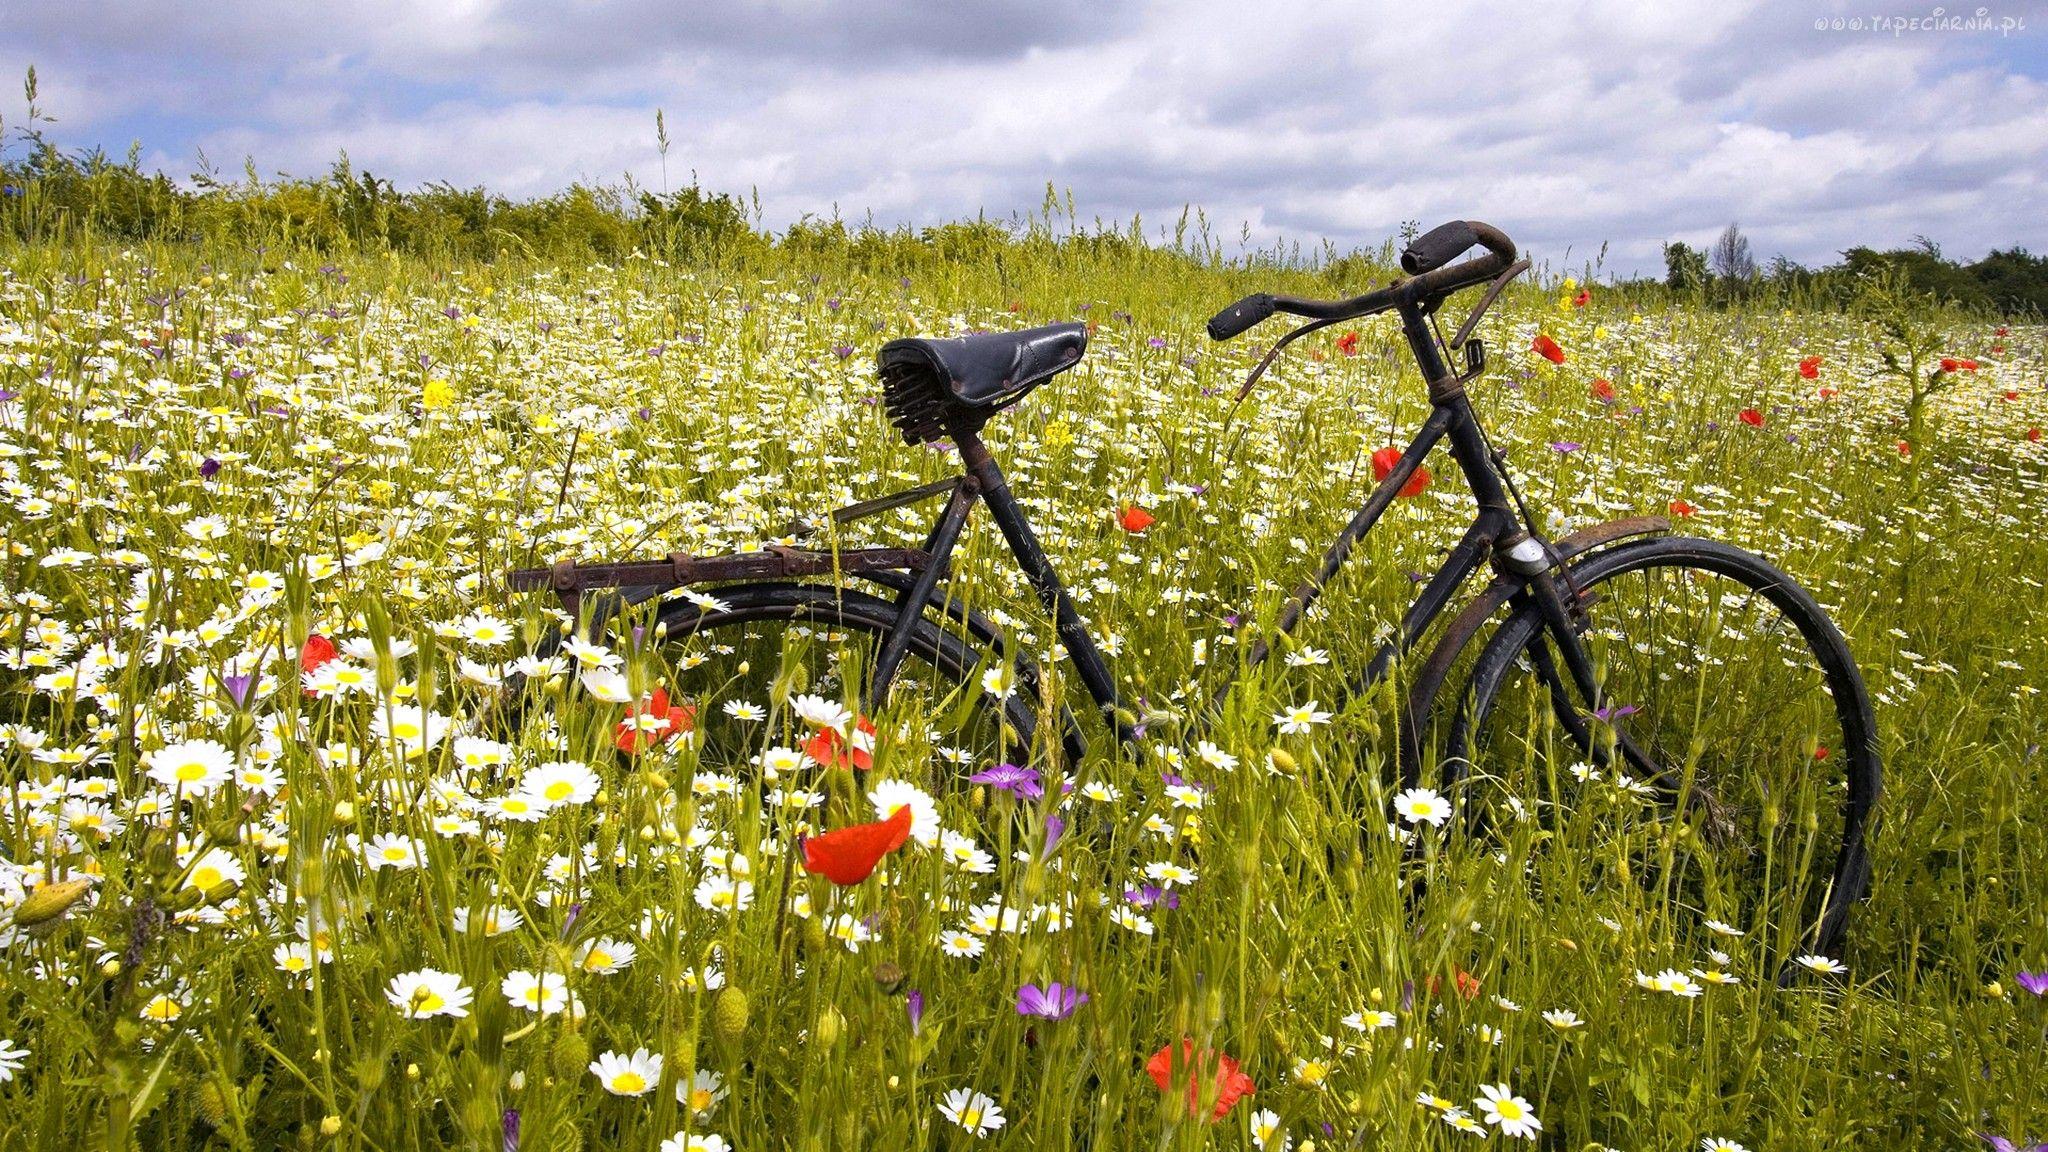 Laka Kwiaty Rower Bicycle Wallpaper Bicycle Nature Wallpaper